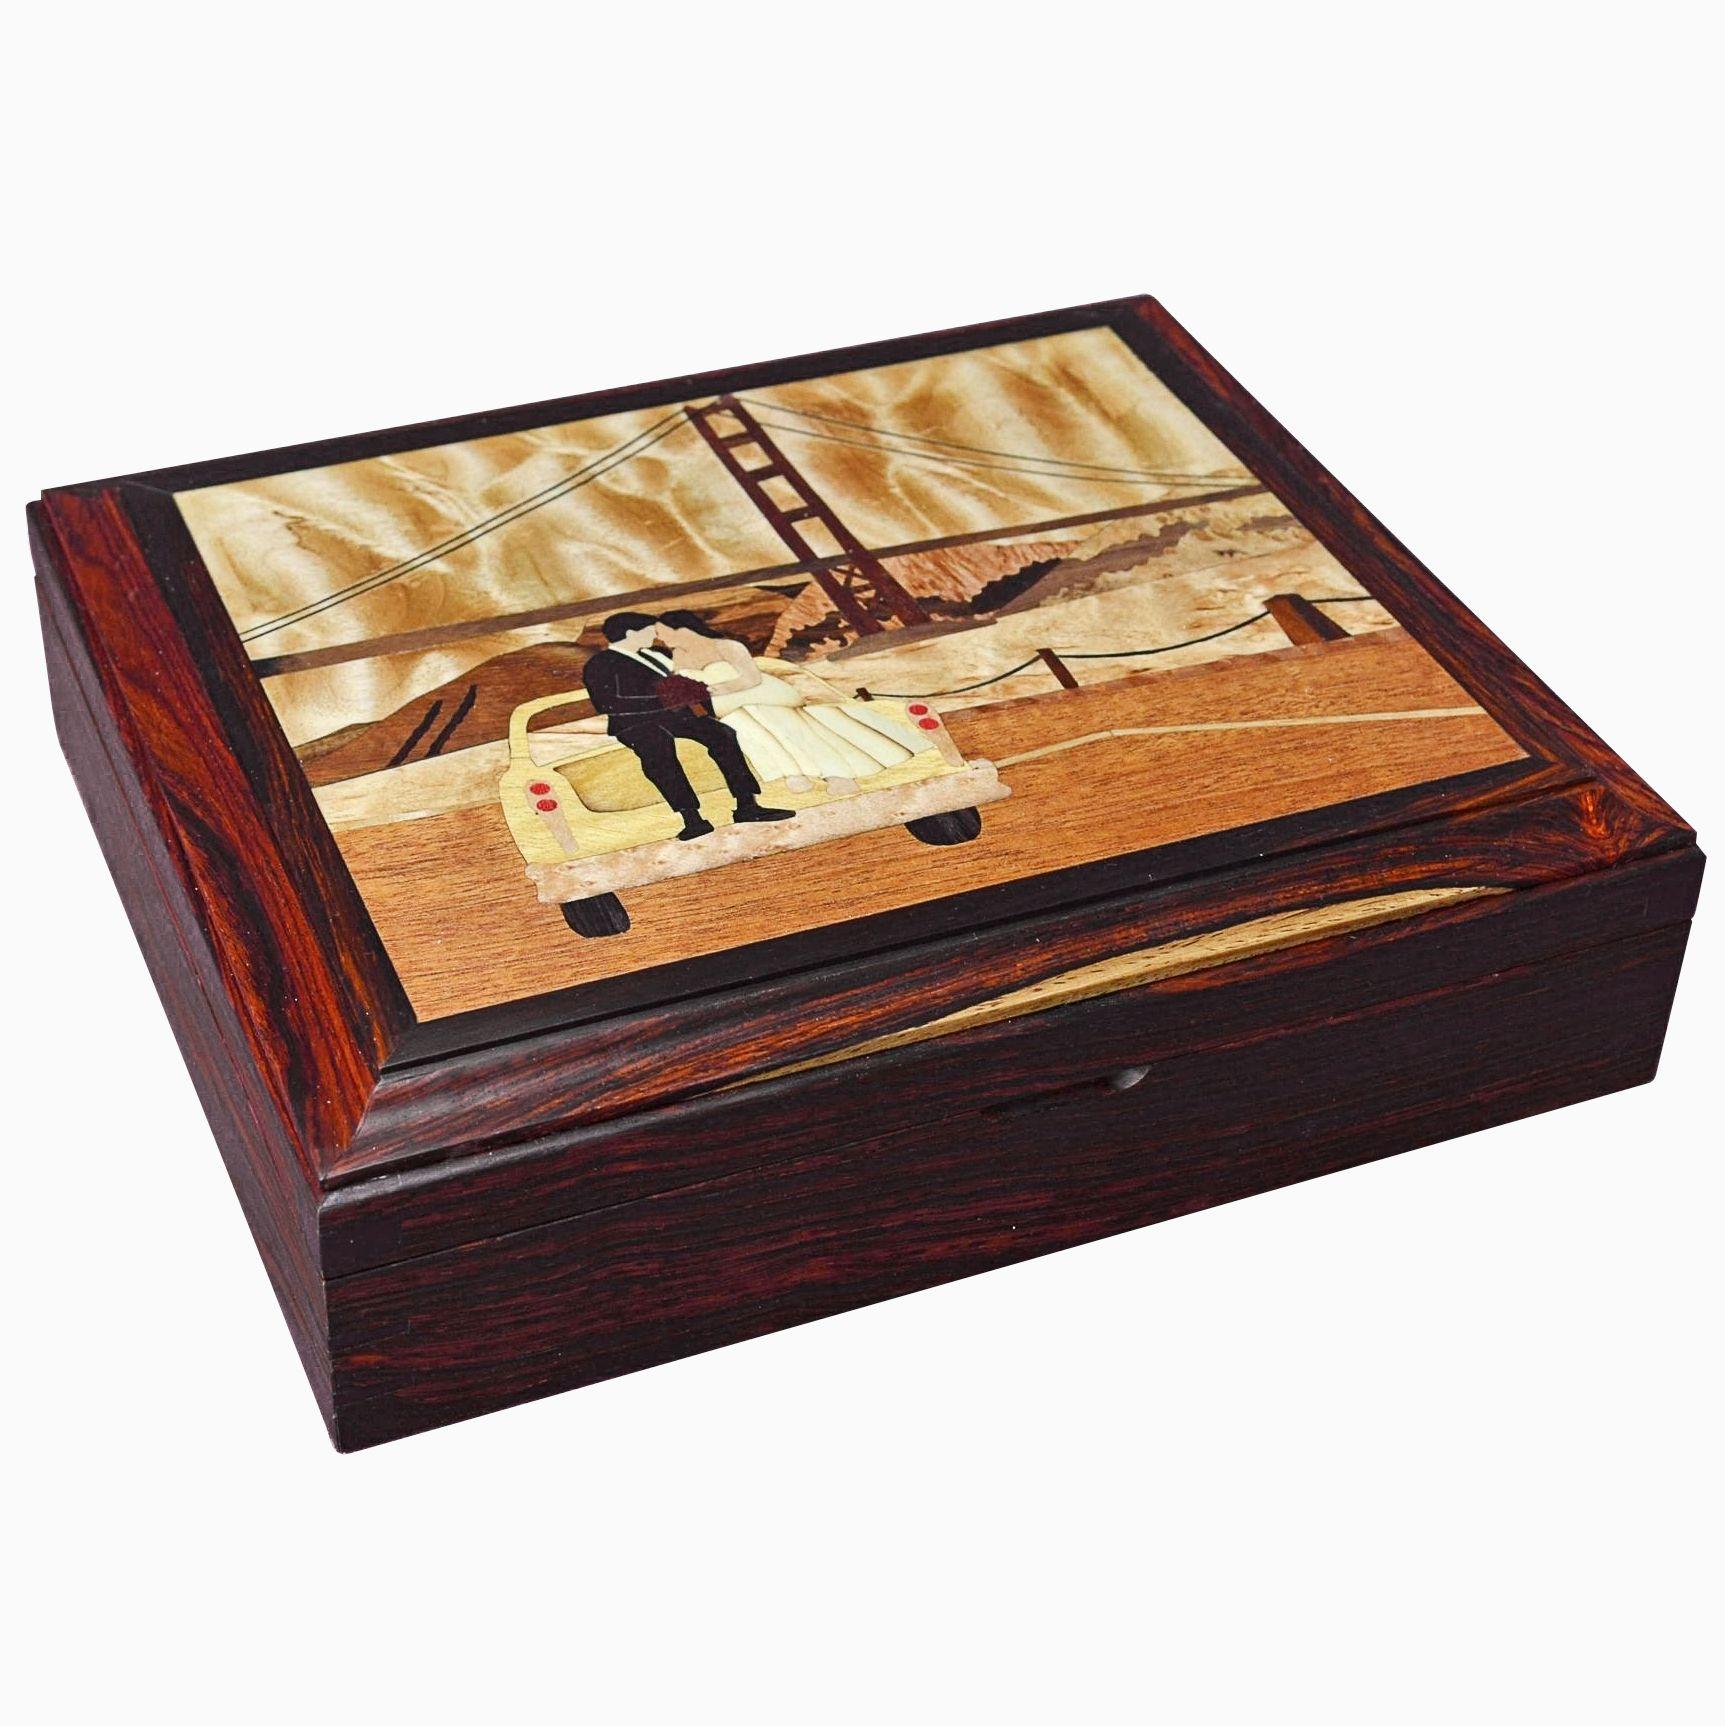 Custom Jewelry Boxes | Handmade Wood Jewelry Boxes | CustomMade.com